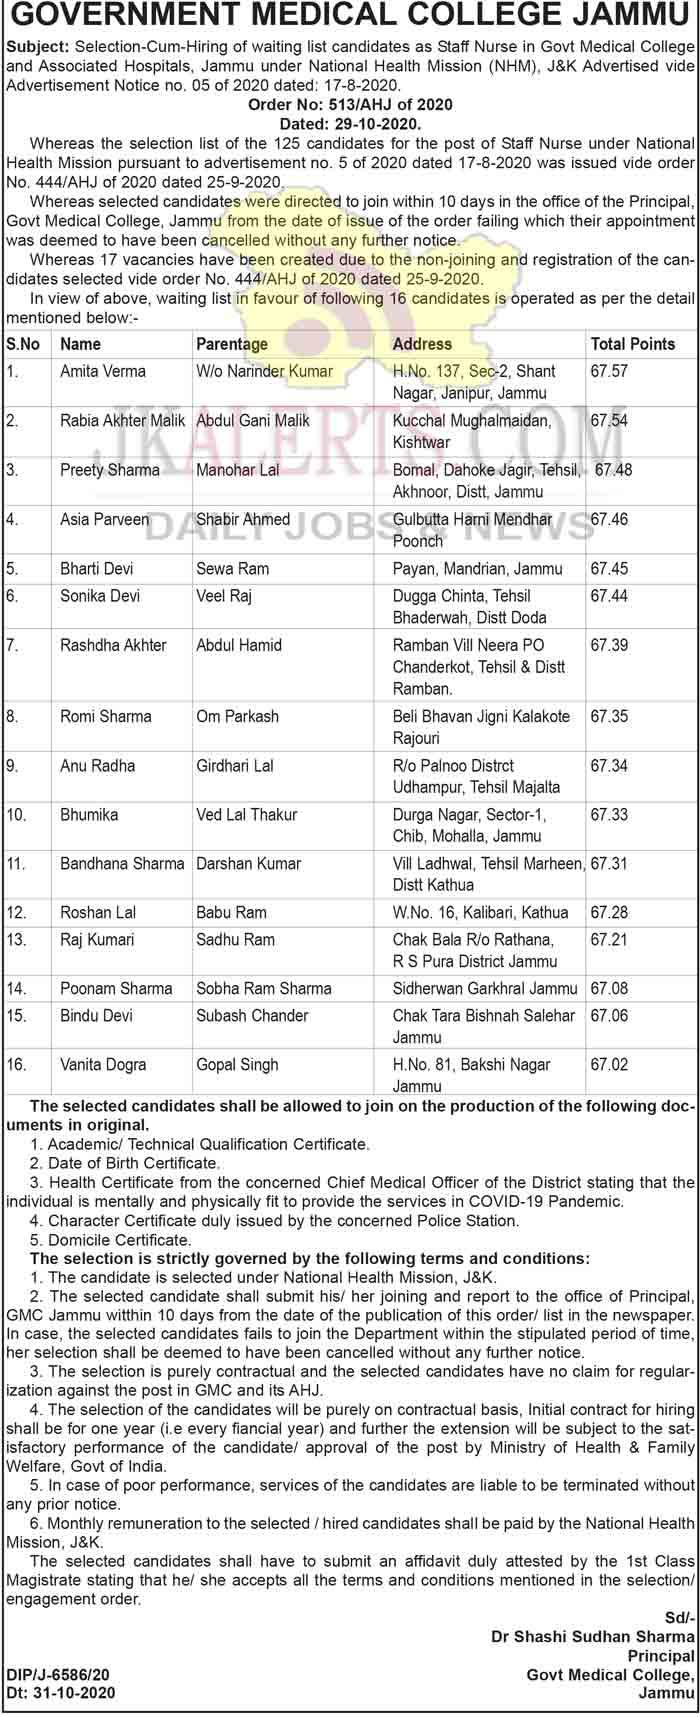 GMC Jammu hiring of waiting list candidates as Staff Nurse.